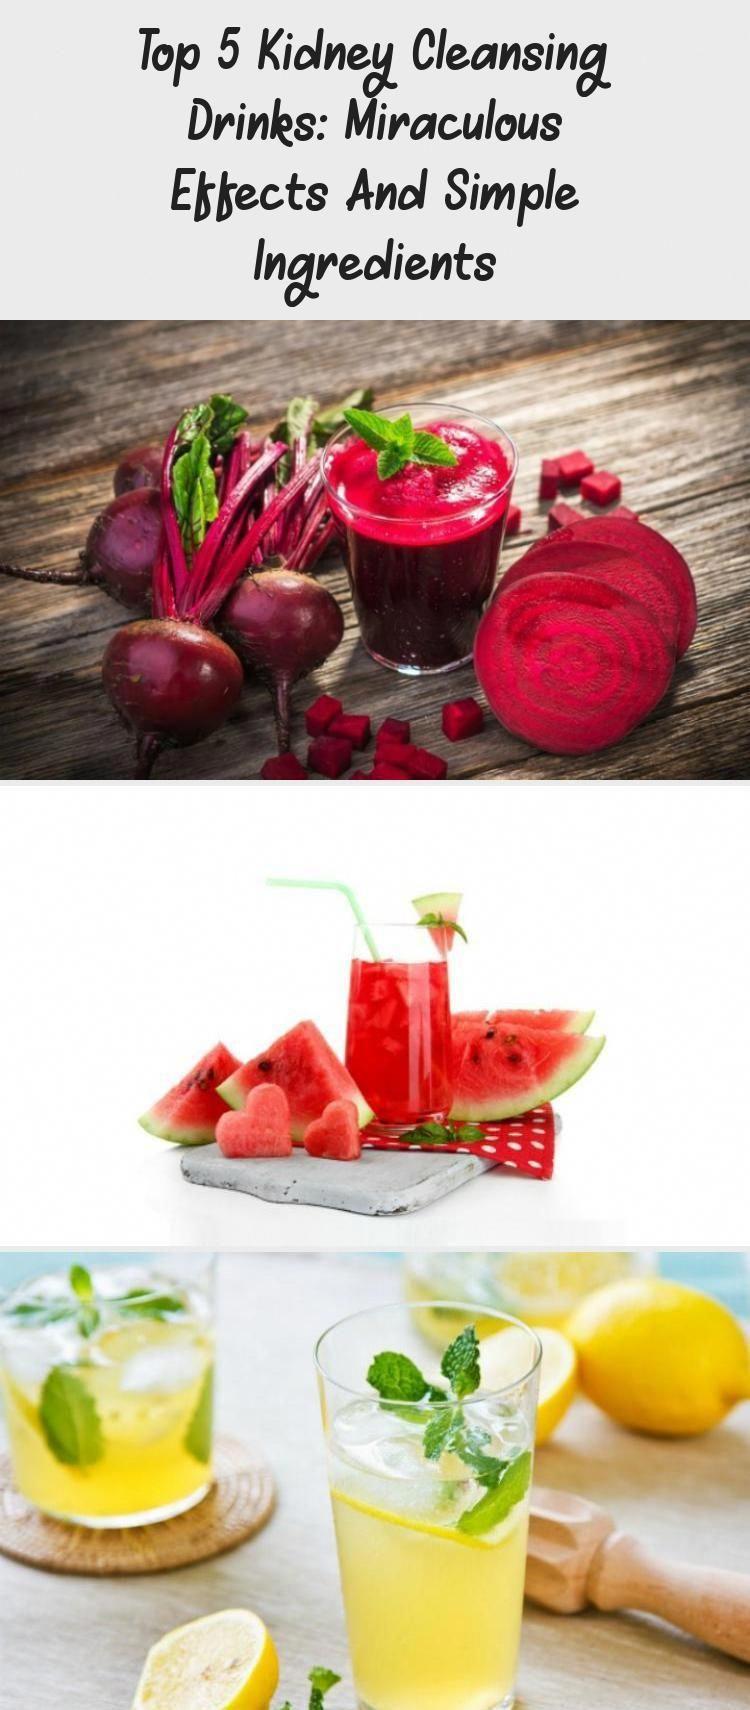 drinks kidney healthy gq cleansing crucial kidneys juices